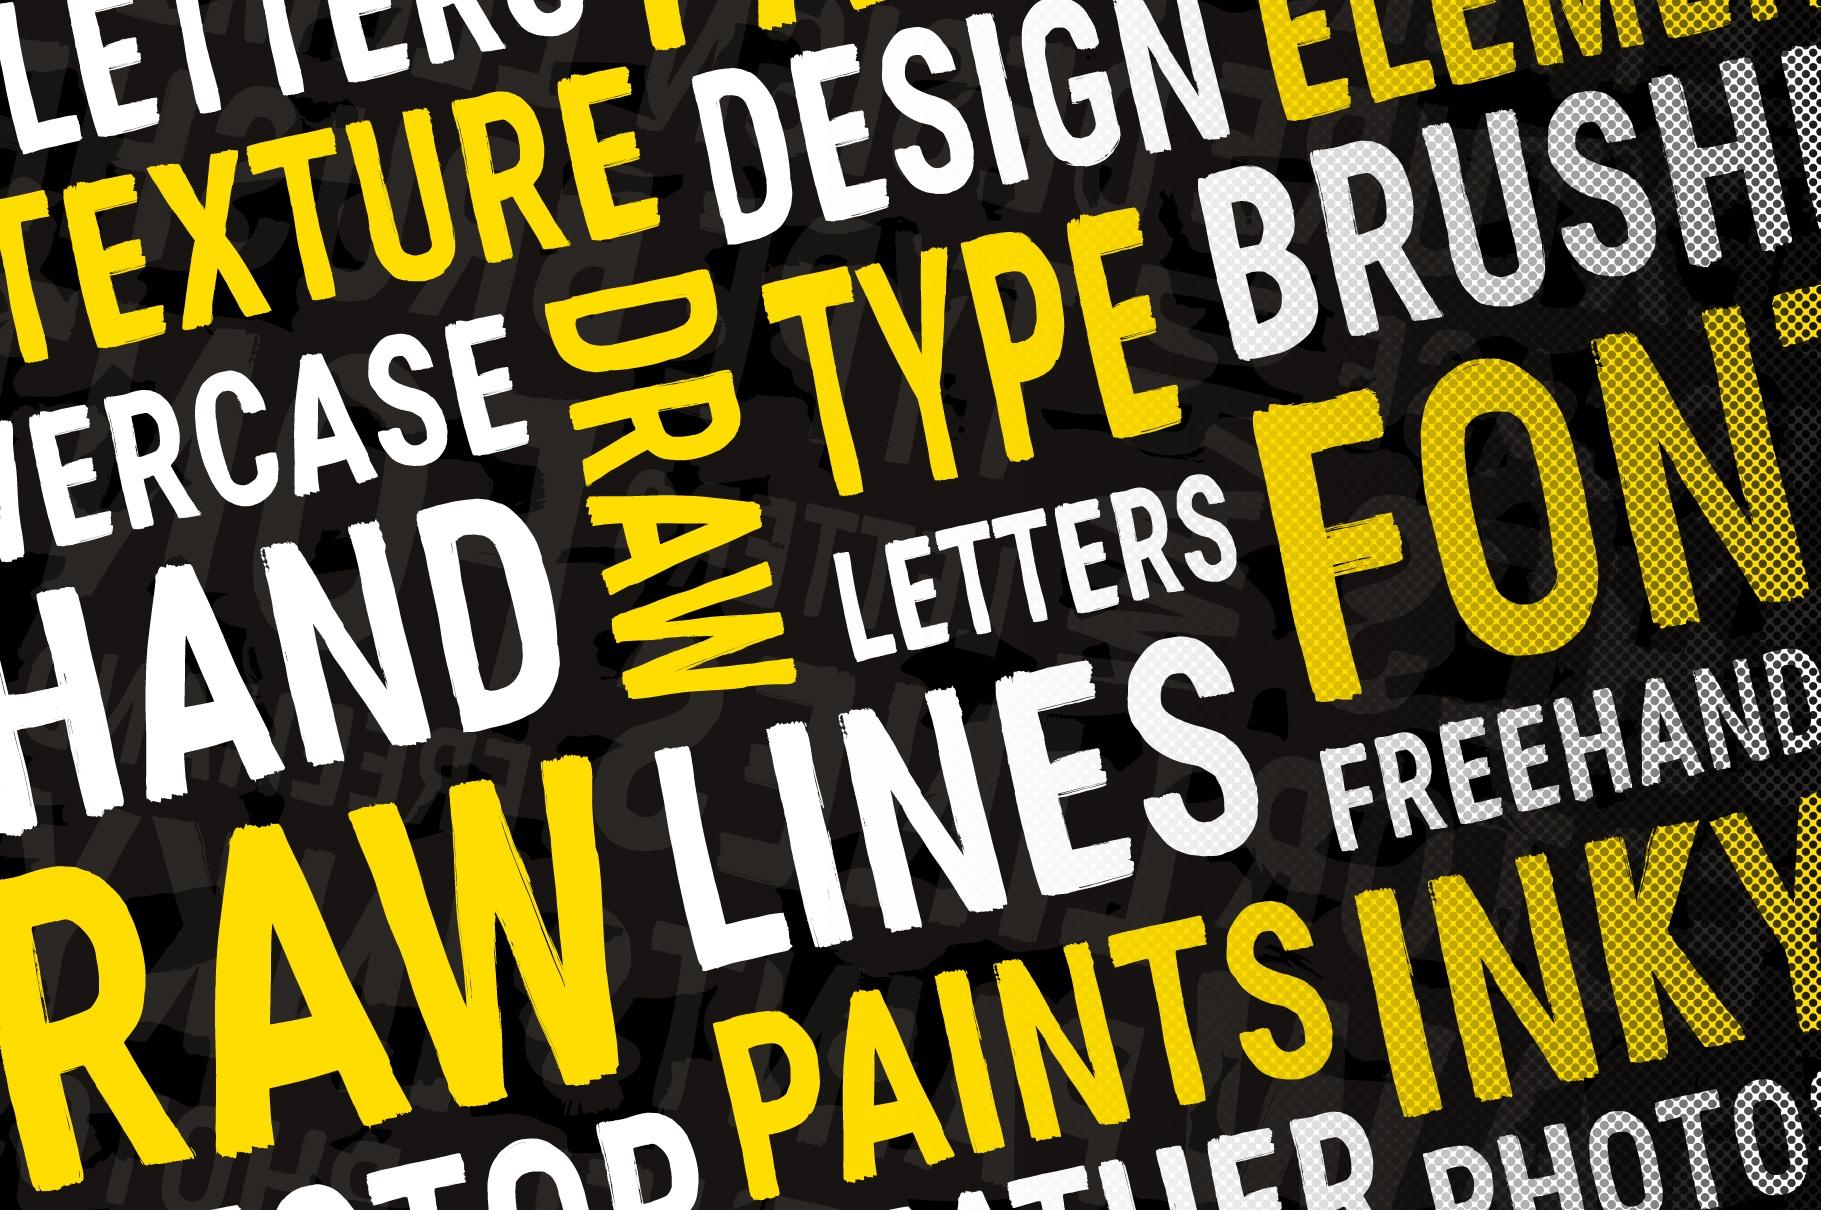 Hand-made textured brush font - Hand-made textured brush font